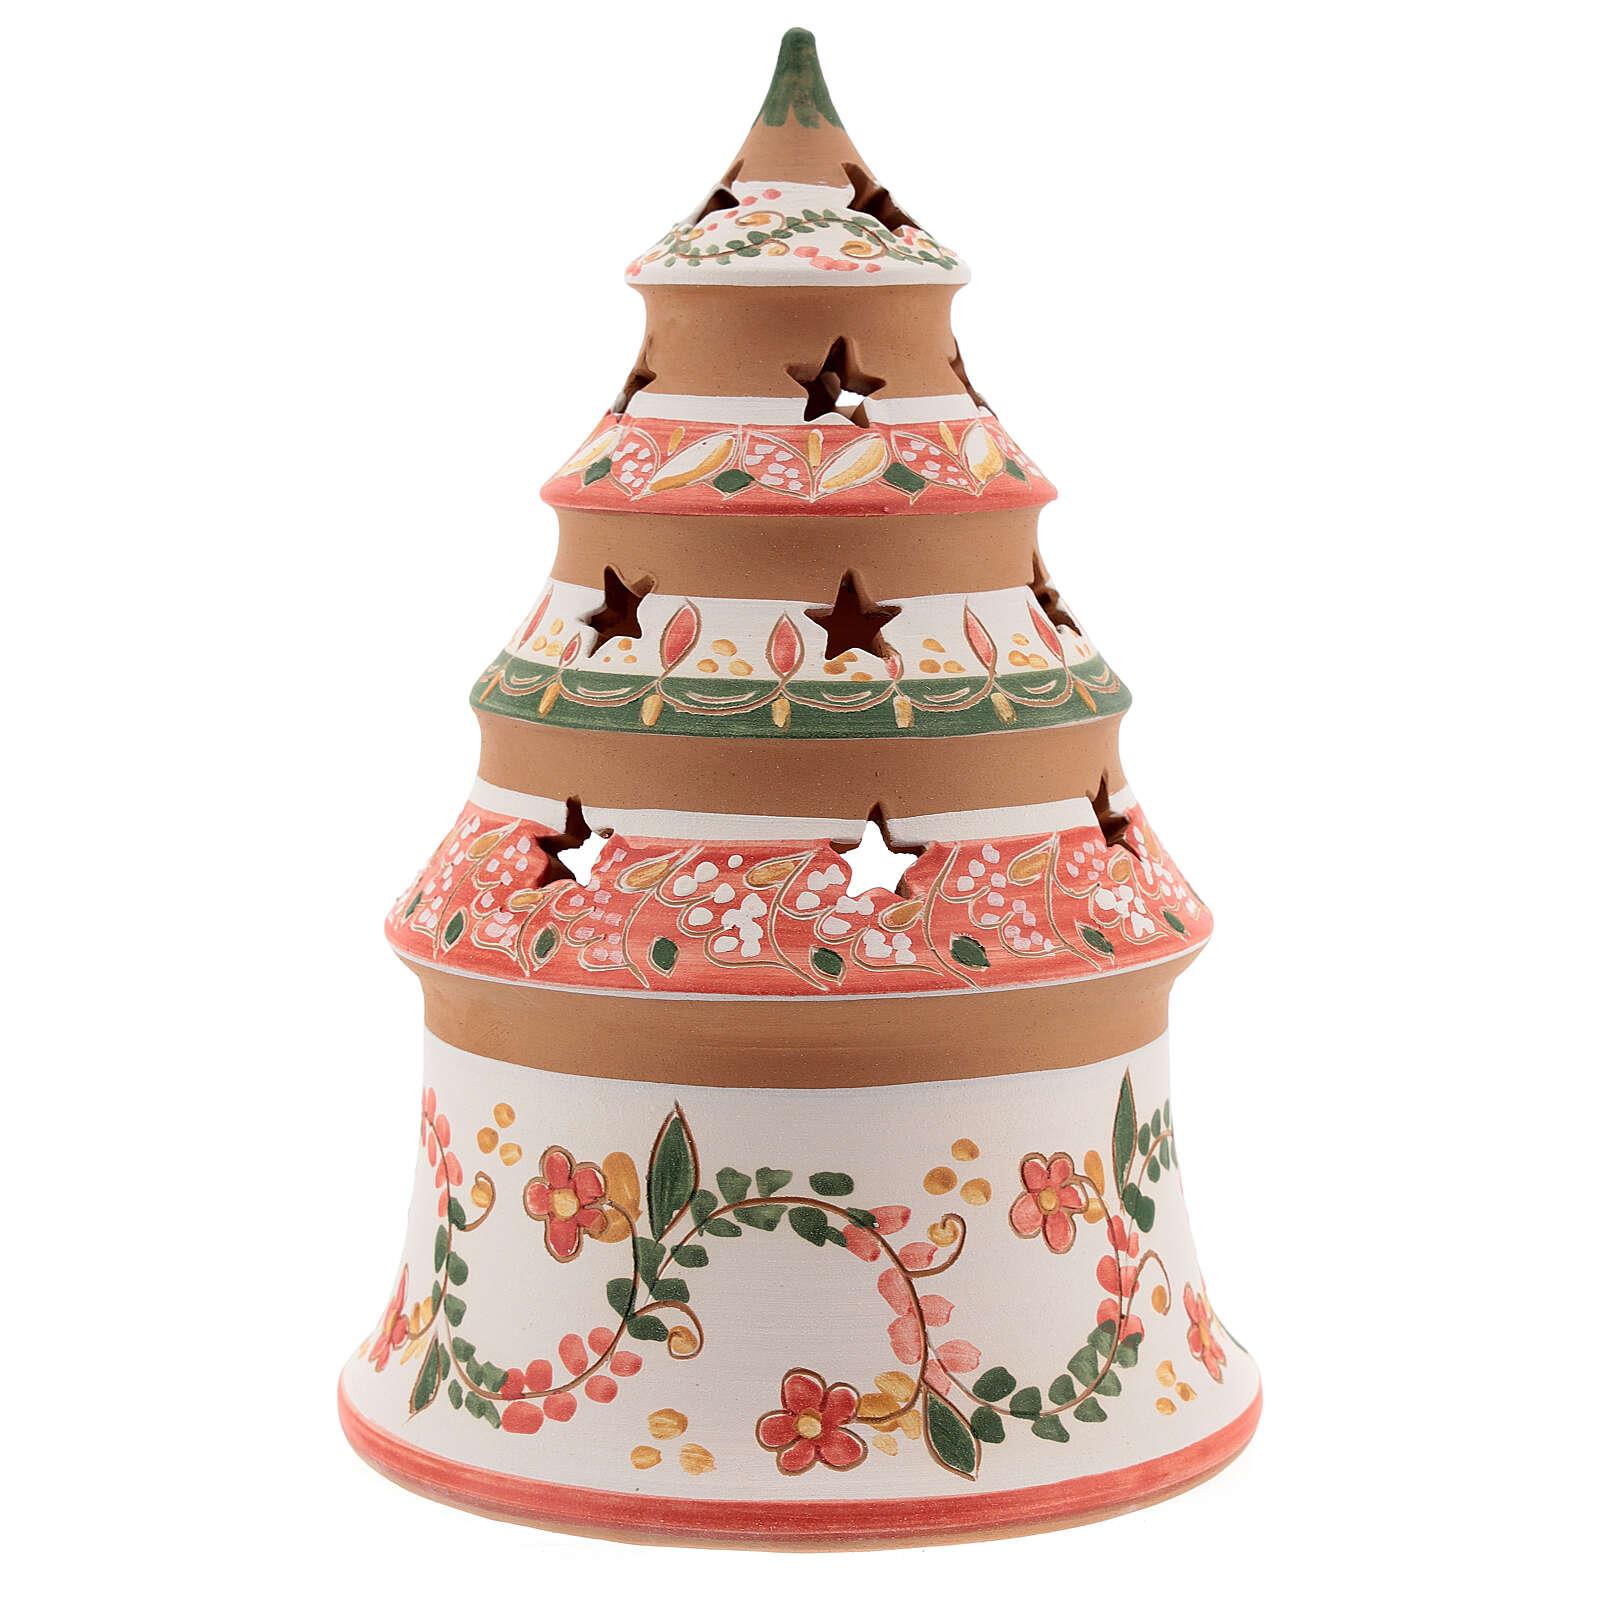 Abete terracotta Natività dipinta lumino Deruta 20 cm rosso 4